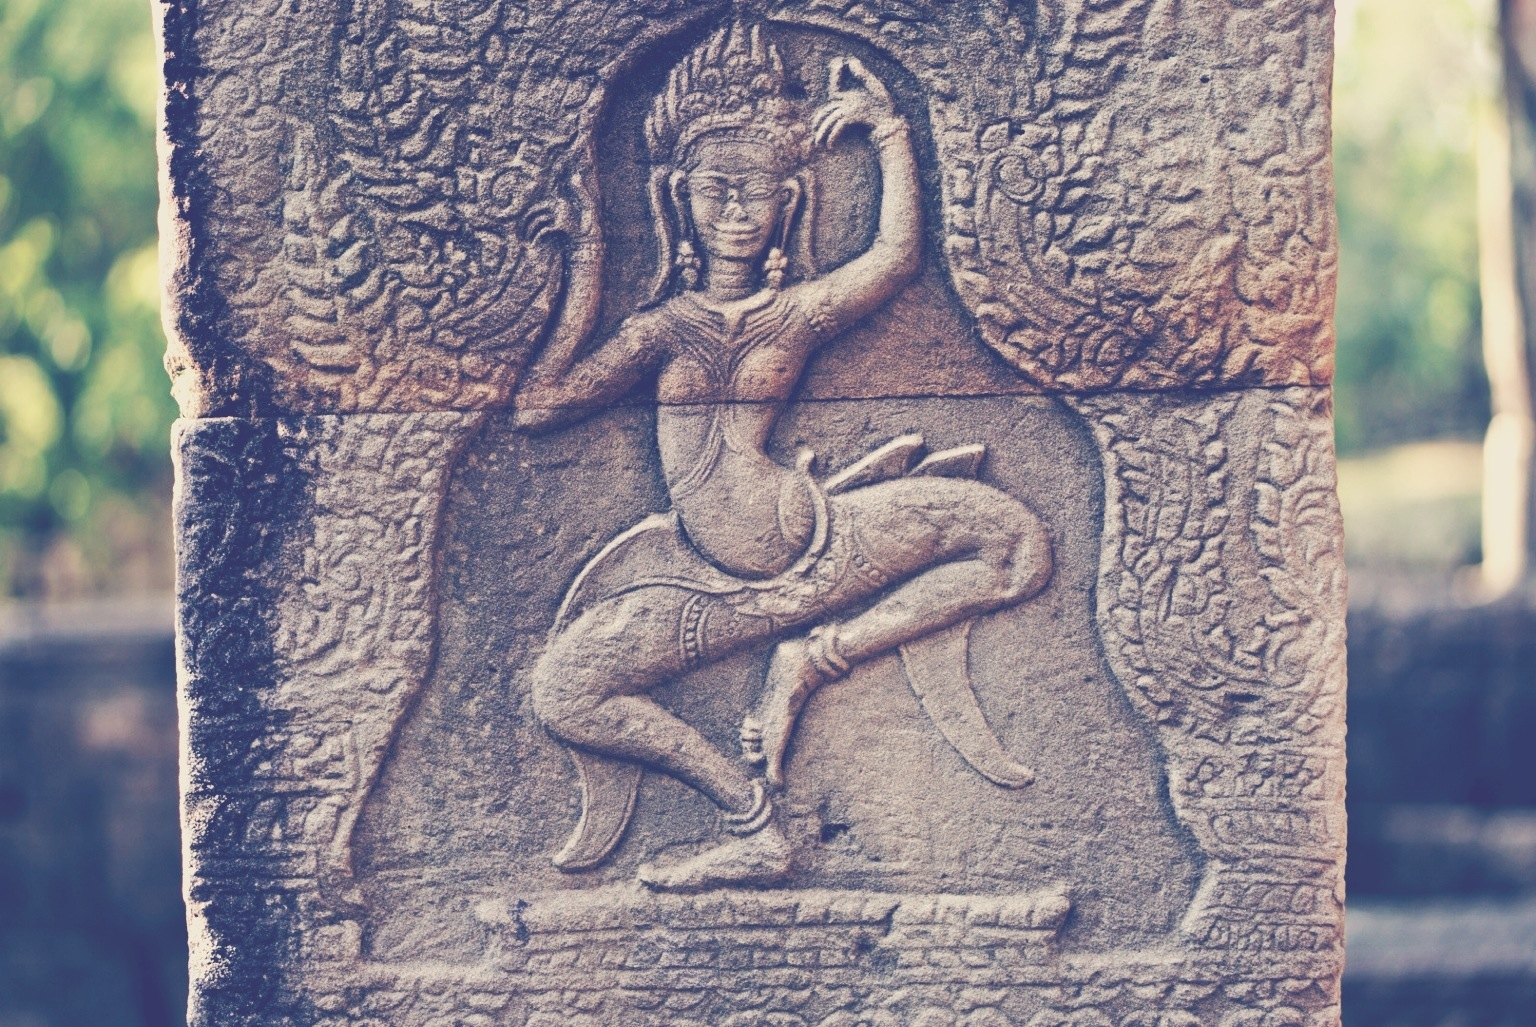 Banteay Kdei, apsara